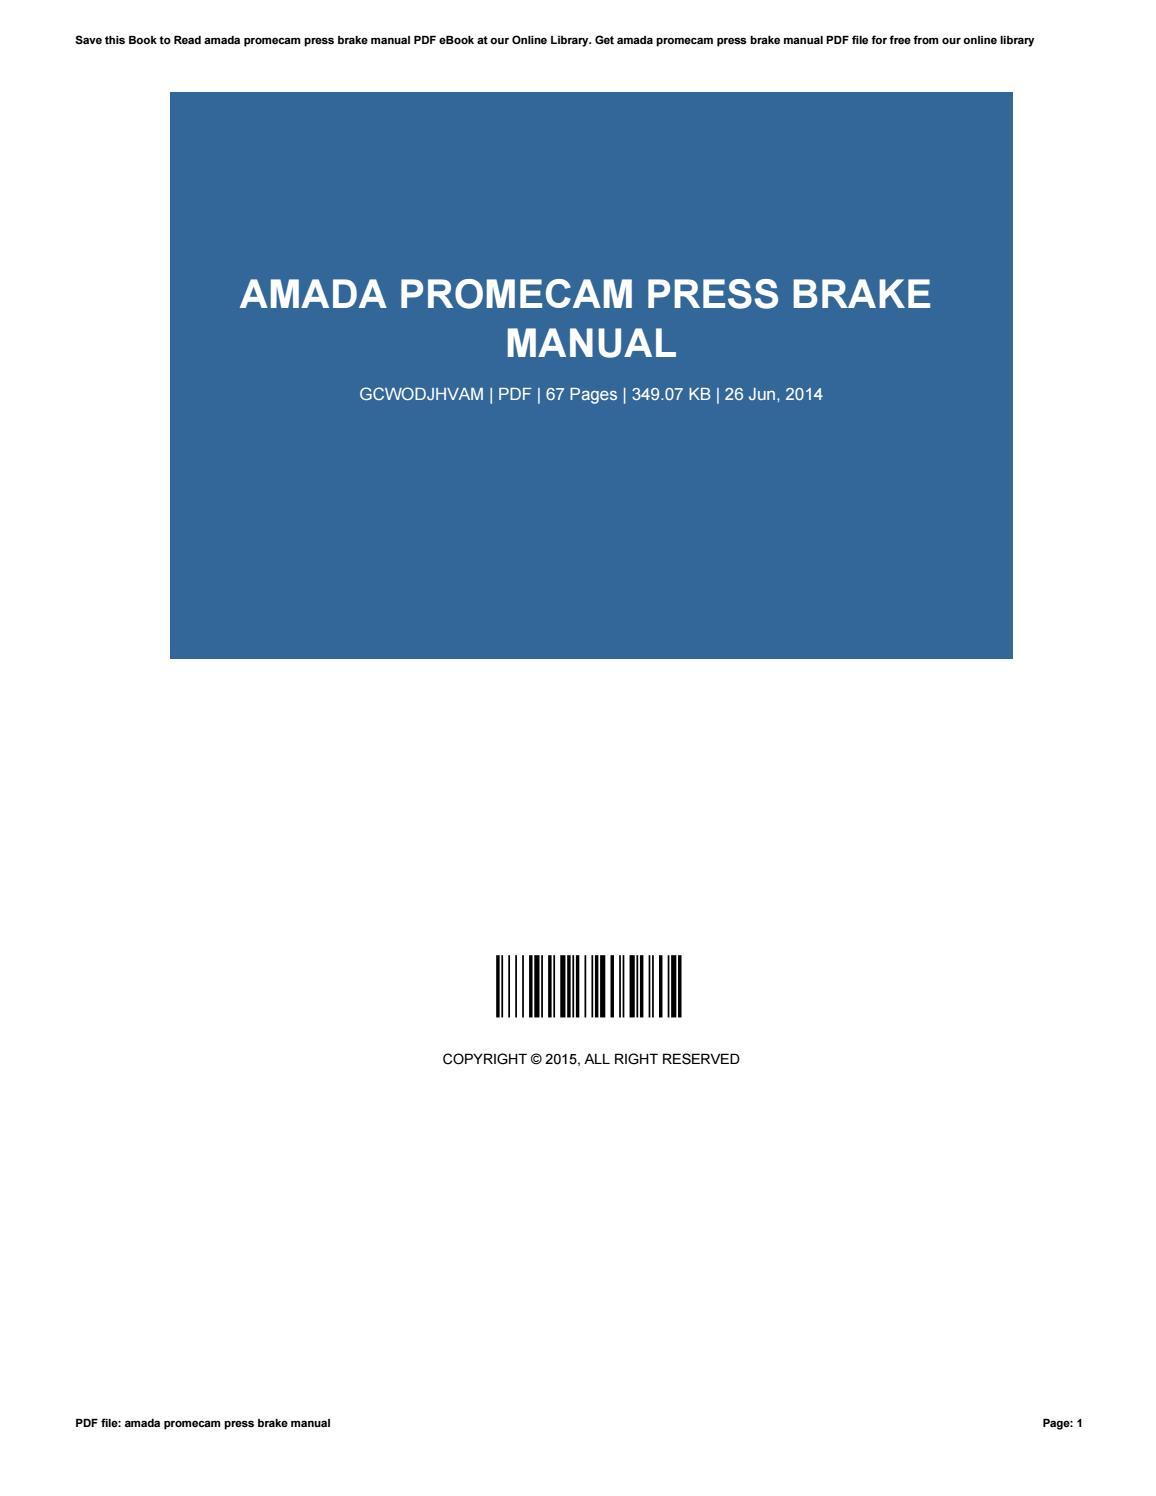 ... Array - amada programing manual ebook rh amada programing manual ebook  zettadata solutions